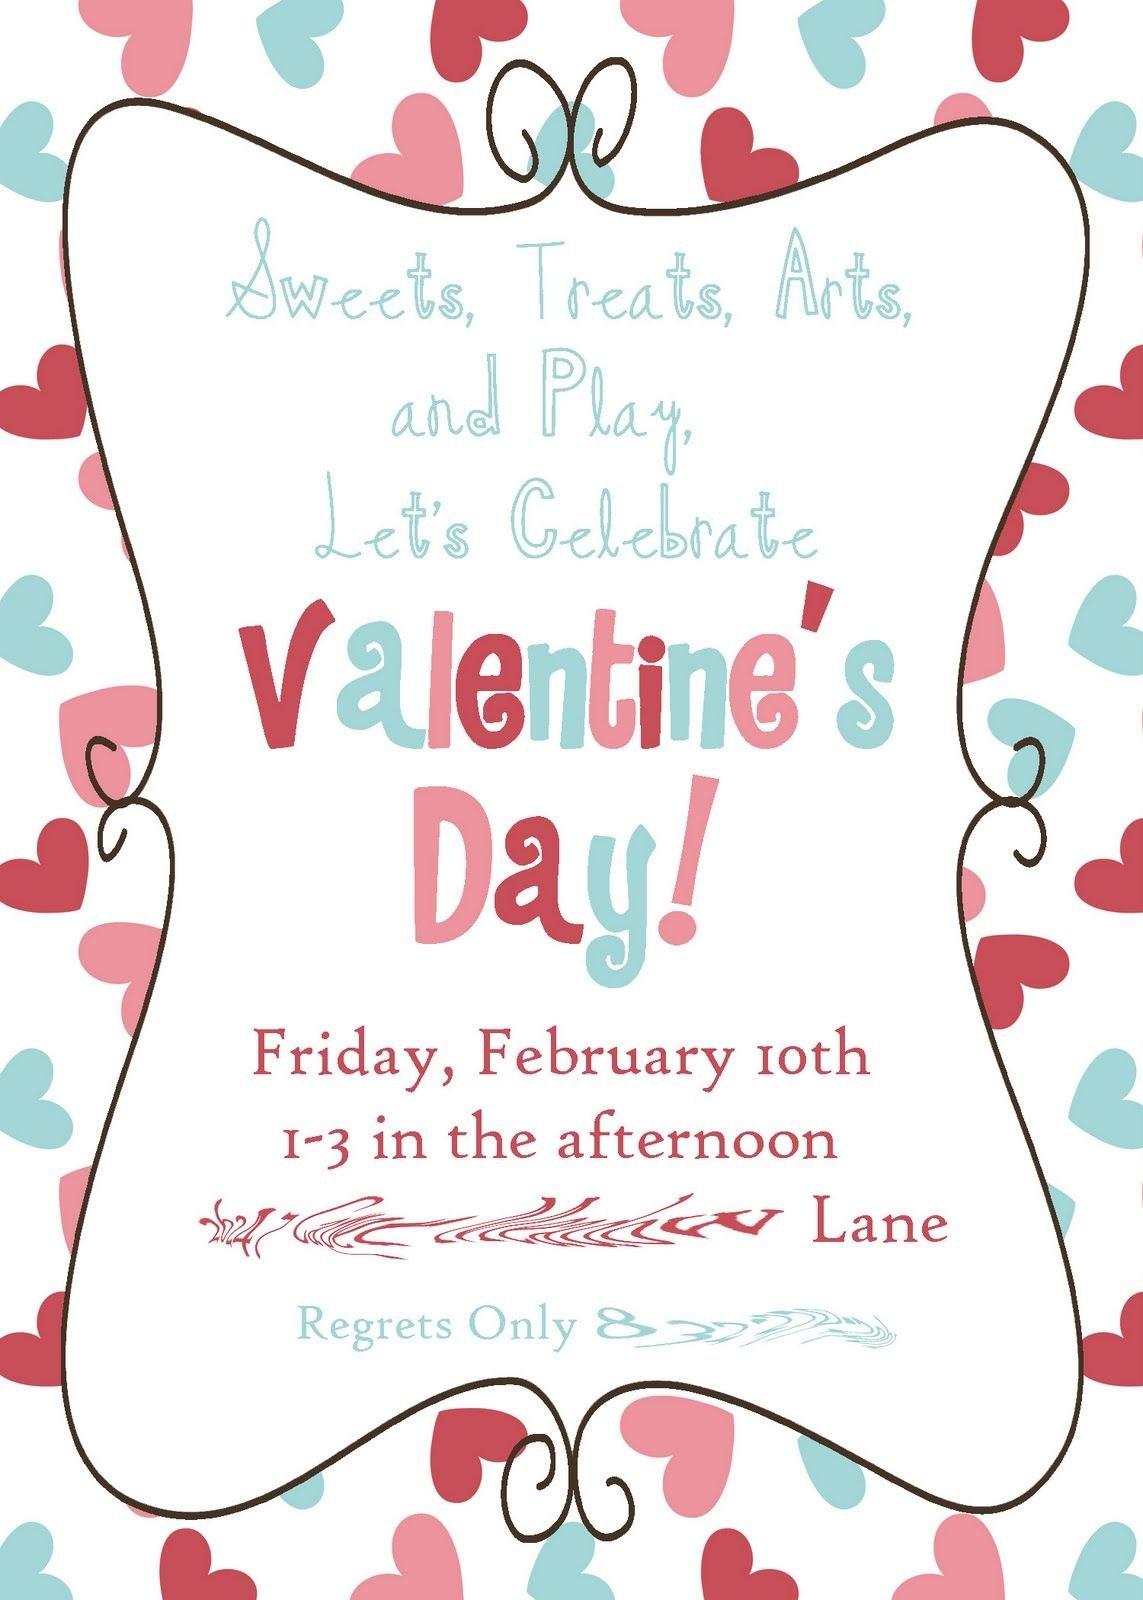 Valentine Party Invitation Templates  Cloud Invitation Pertaining To Valentine Party Invitation Template